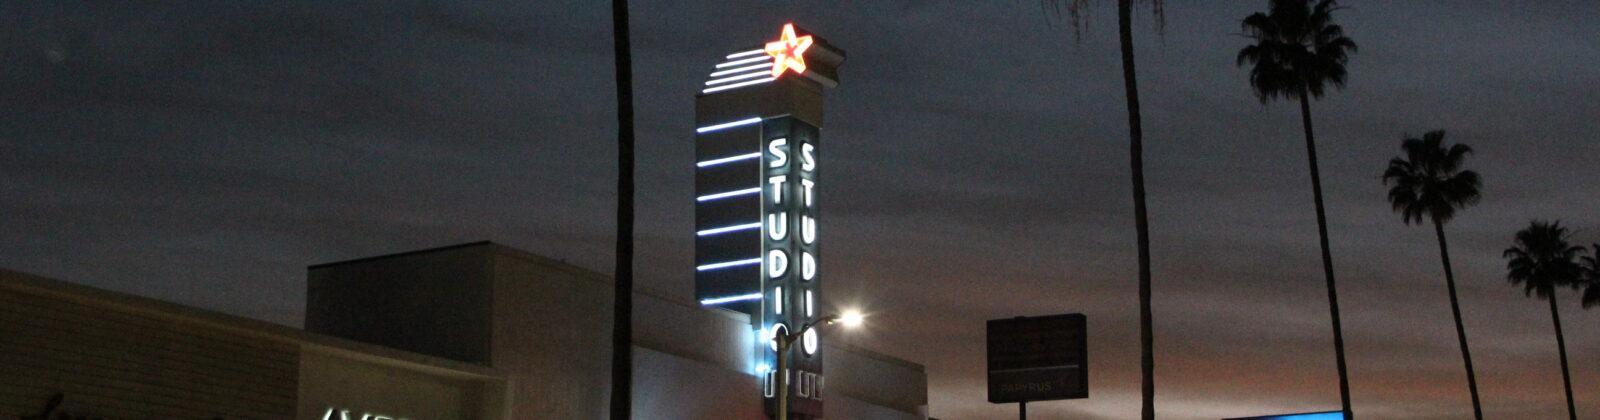 Studio City Remodels Amp Repairs Service List